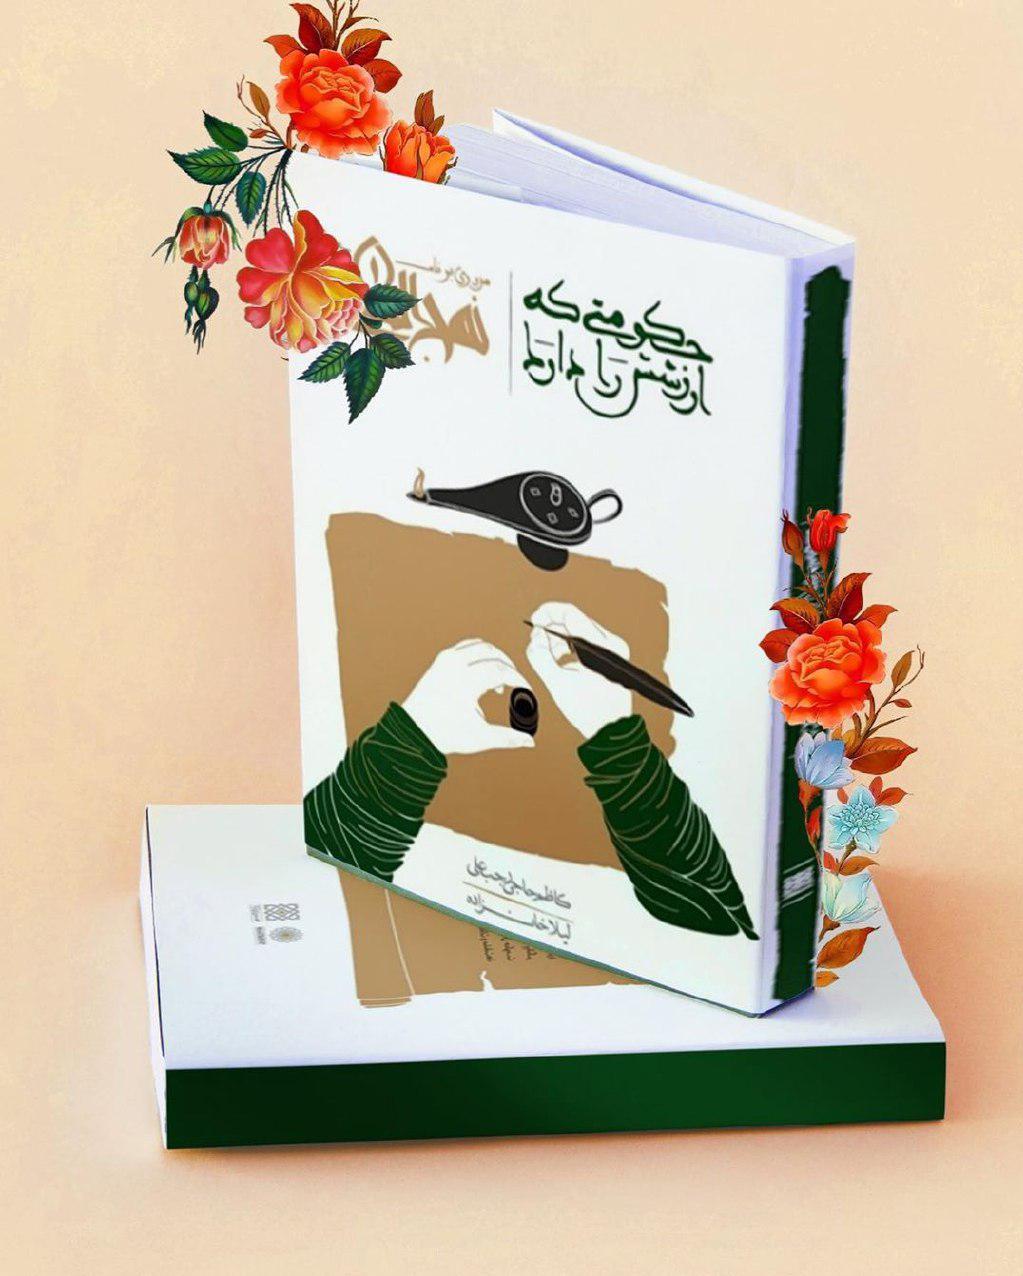 13990517000396 Test NewPhotoFree - محمود کریمی بازهم کتاب معرفی کرد/ هم مردم بخوانند و هم مسئولان